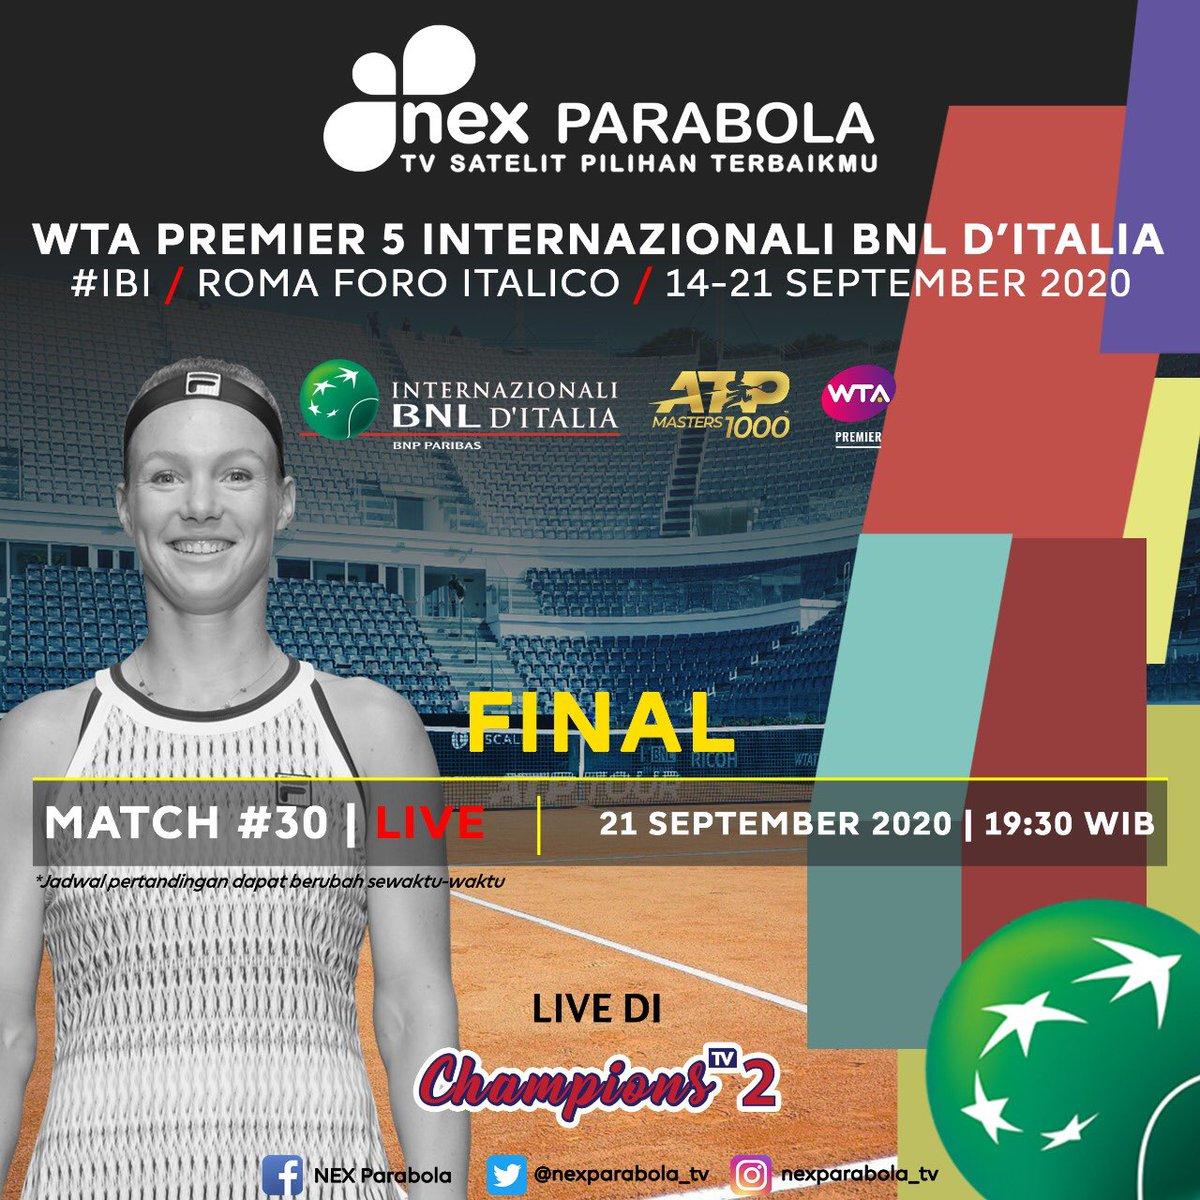 Final WTA Premier 5 Internazionali BNL D'Italia✨ Saksikan pertandingan Internazionali BNL D'Italia 21 September 2020  Match 30 pukul 19:30 WIB LIVE hanya di receiver Nex Parabola Channel Champions TV 2  #nexparabolatv #wta #ibi https://t.co/u22uHVWHDv